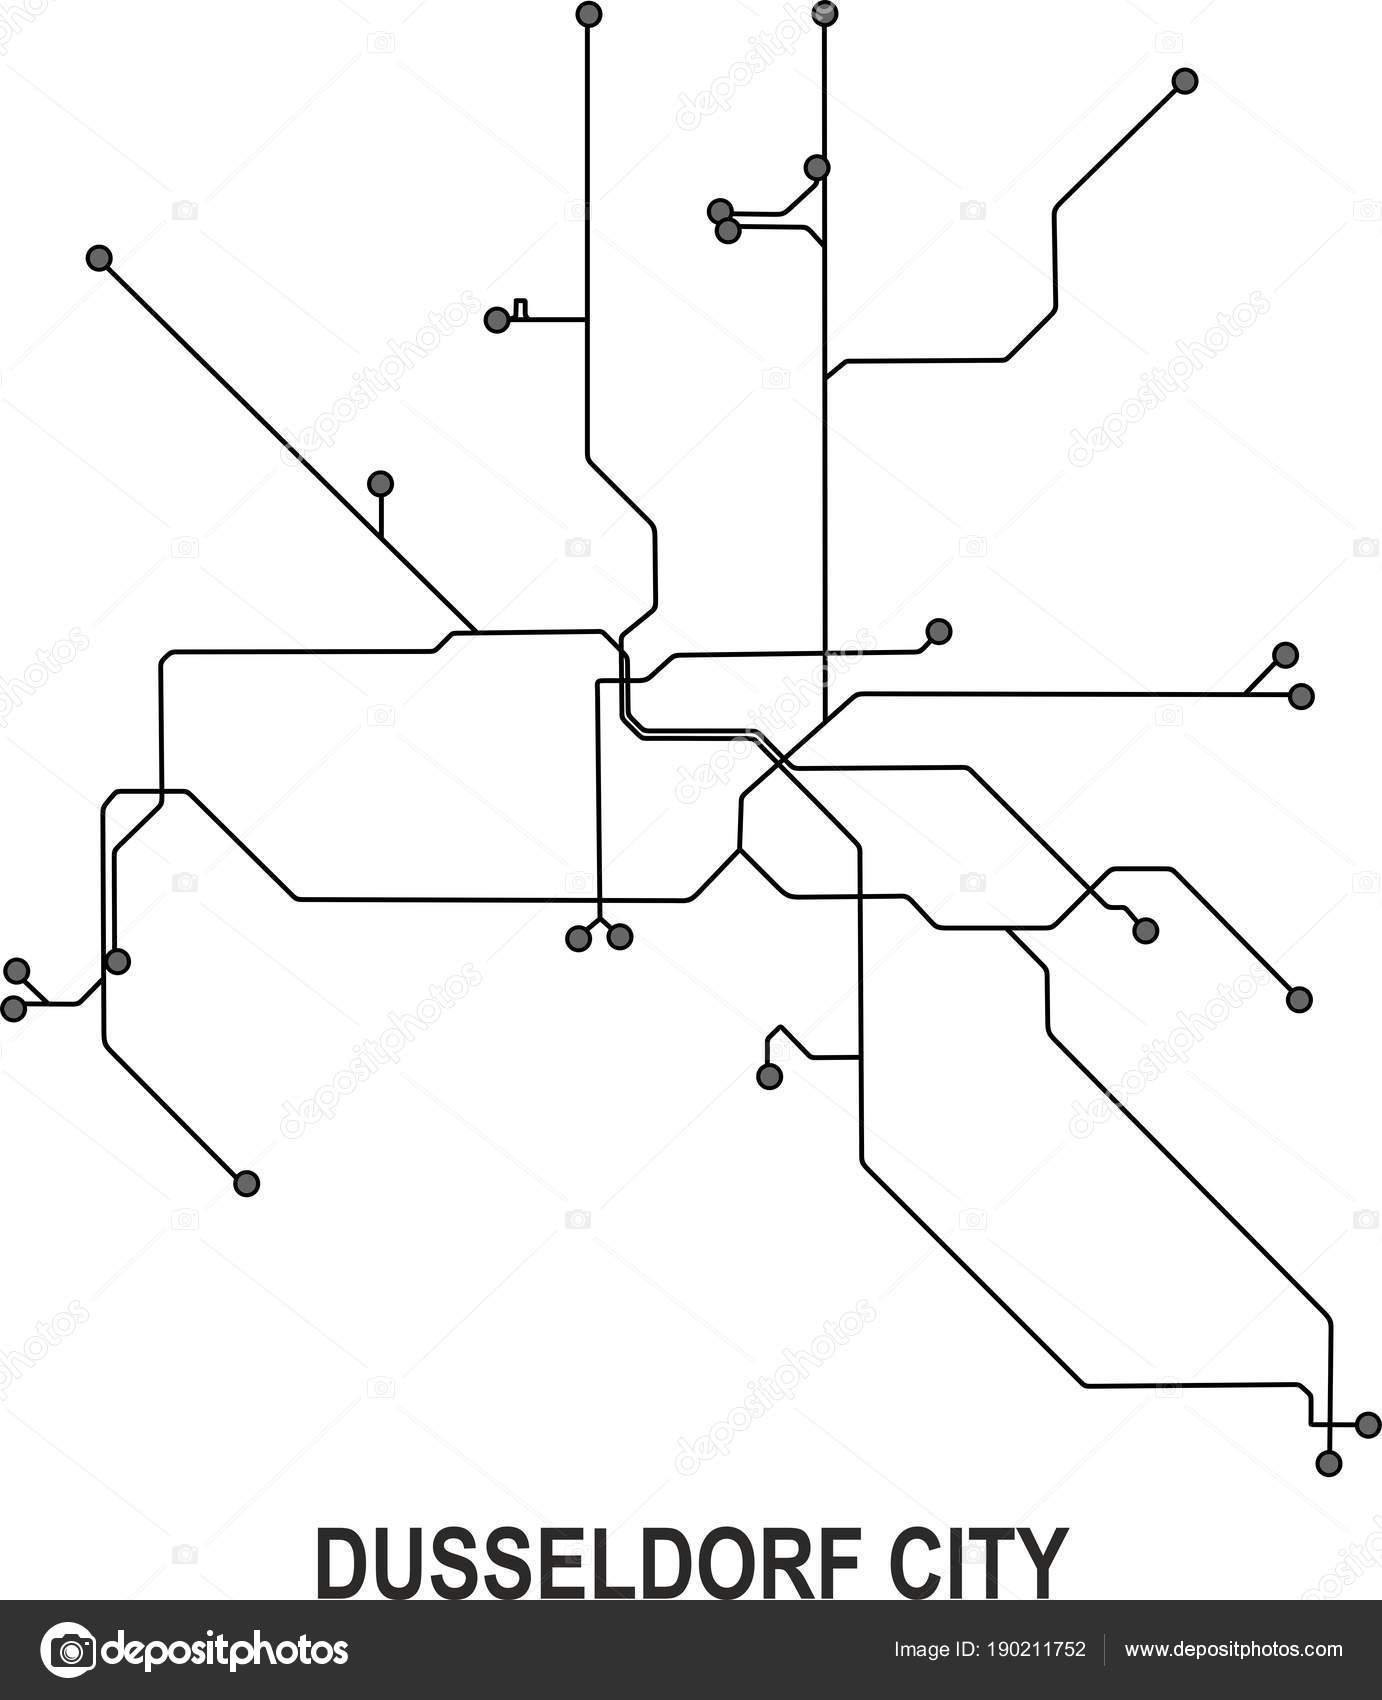 Dusseldorf Subway Map.Duesseldorf Subway Vector Map File Stock Vector C Fishvector